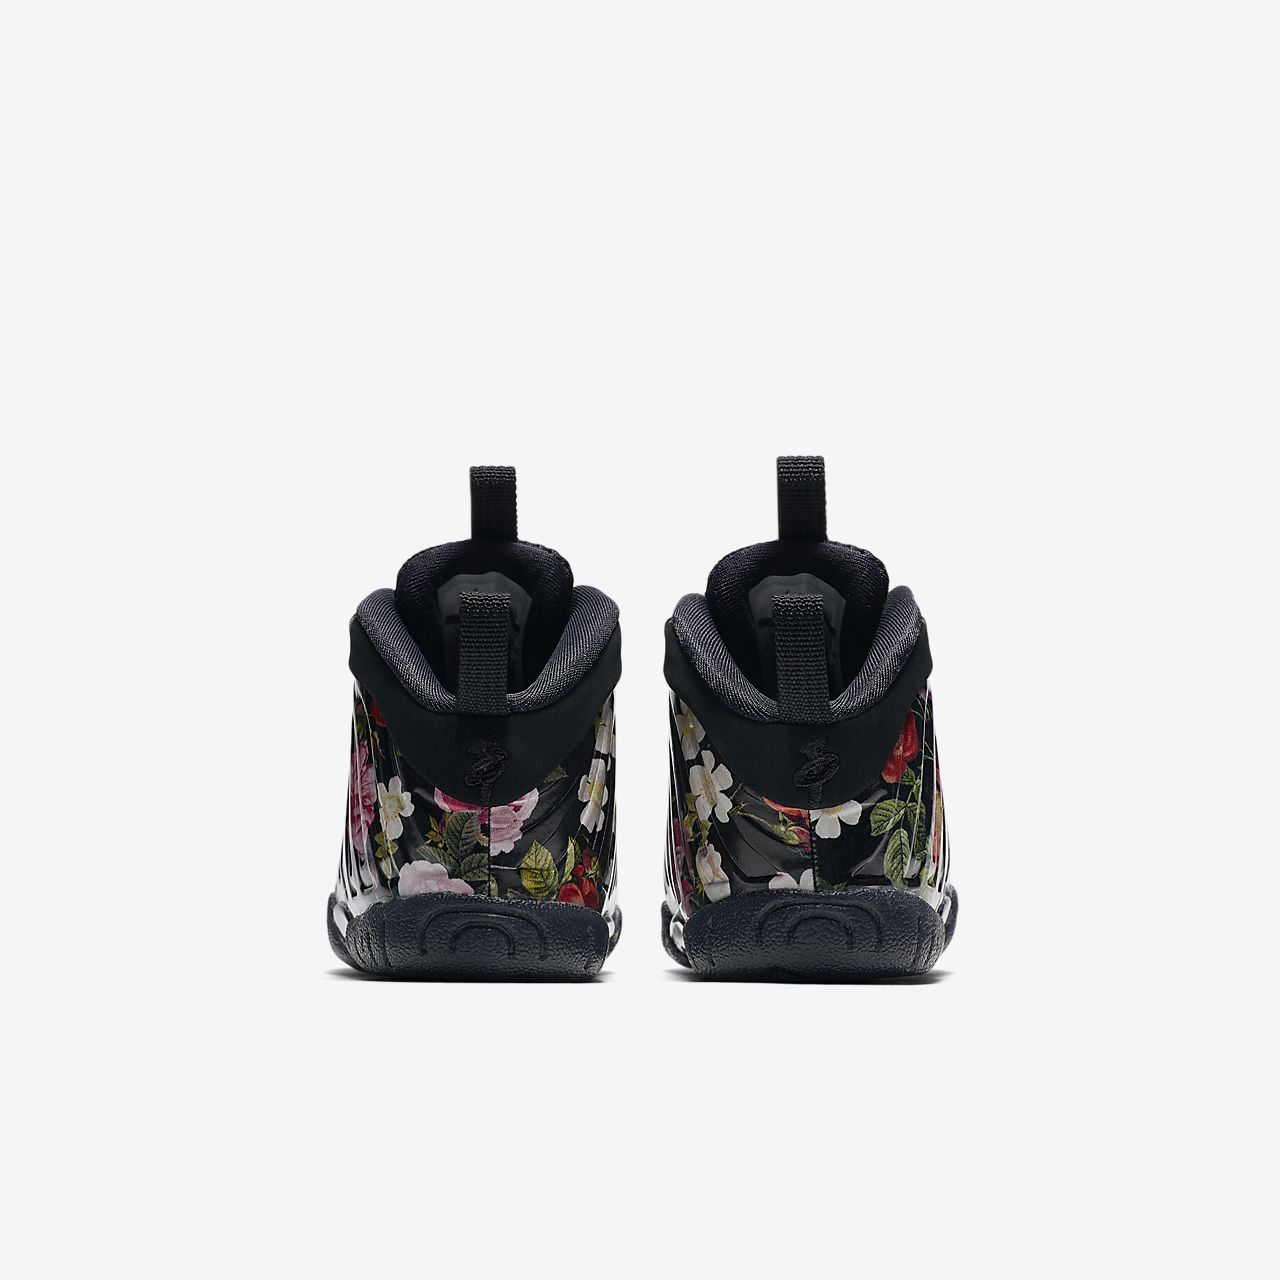 timeless design 2fb1b 98d30 ... Nike Little Posite One PRM TD Floral 婴童运动童鞋